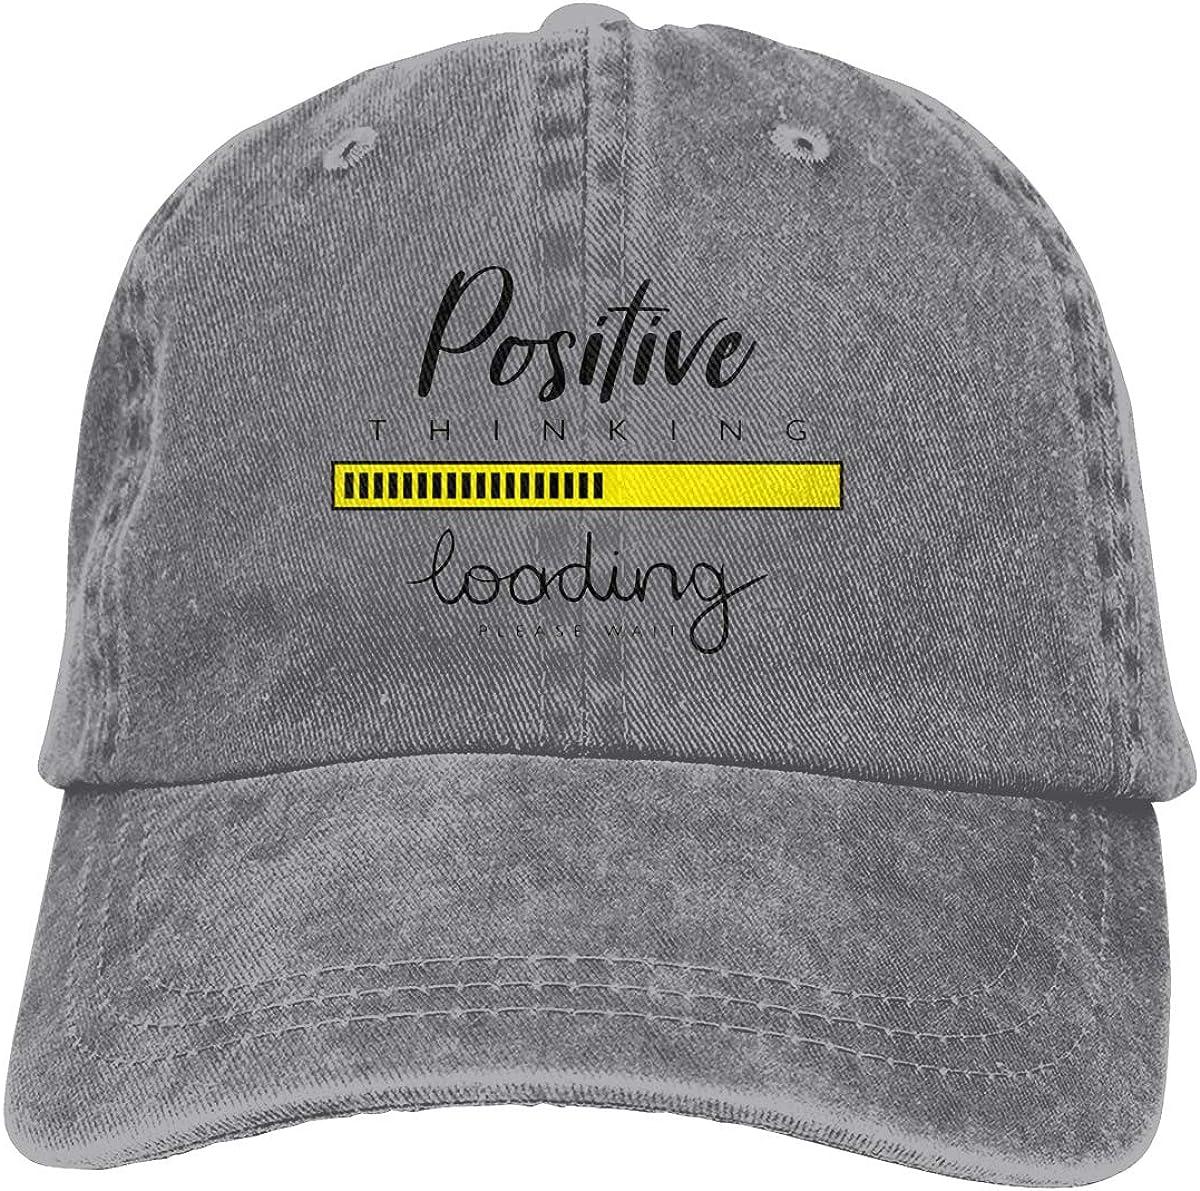 Positive Thinking Loading Vintage Unisex Adjustable Baseball Cap Denim Dad Hat